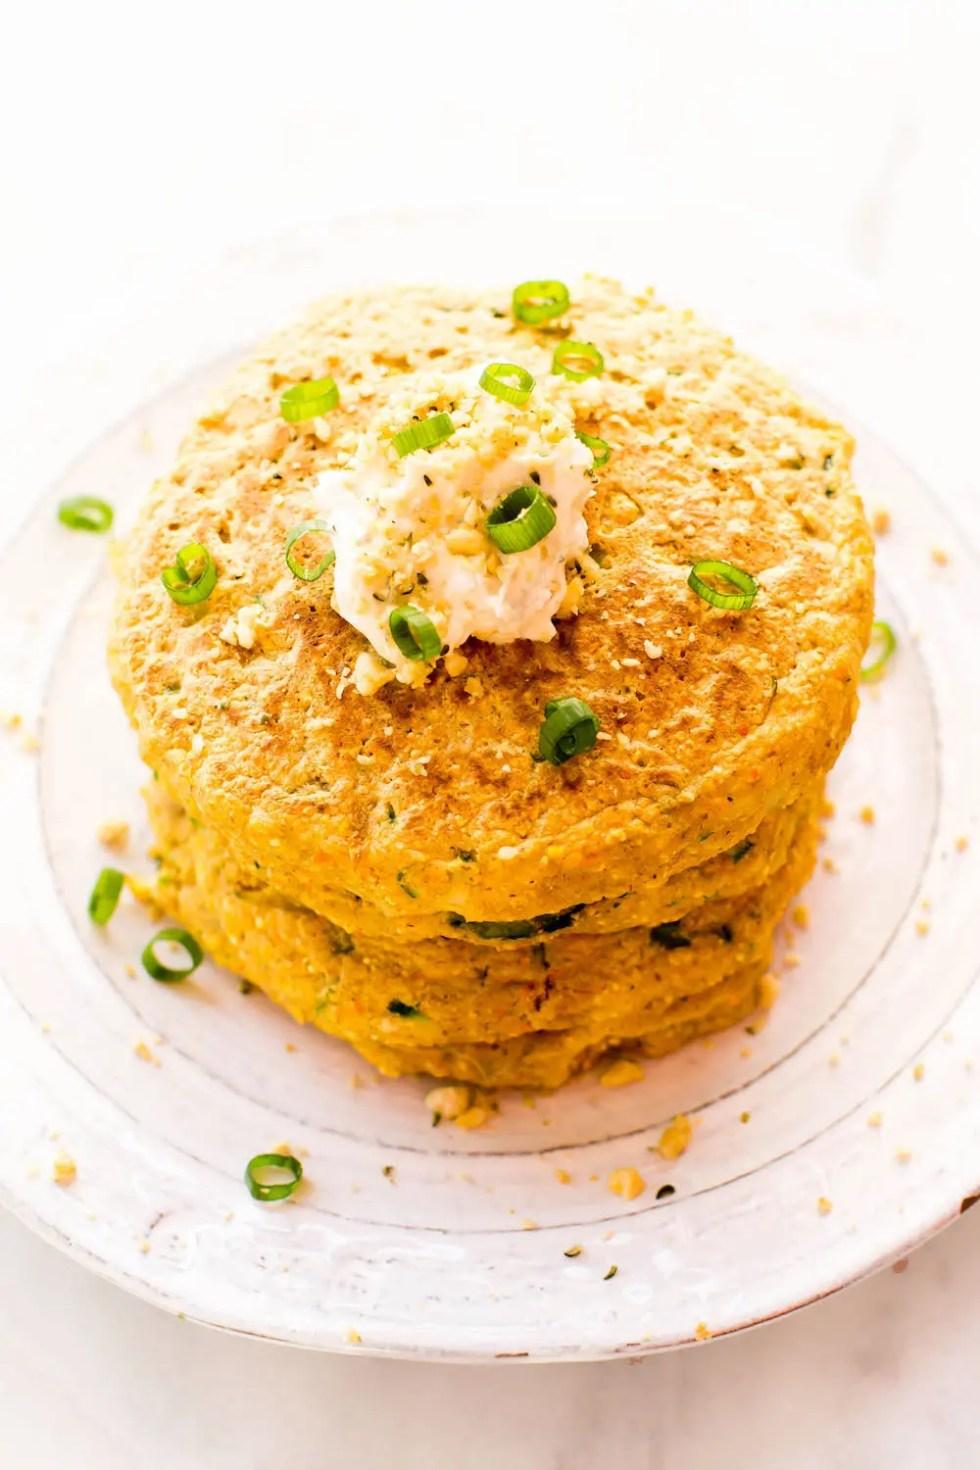 Zucchini Cornmeal Savory Pancakes {vegan, gluten-free, oil-free}